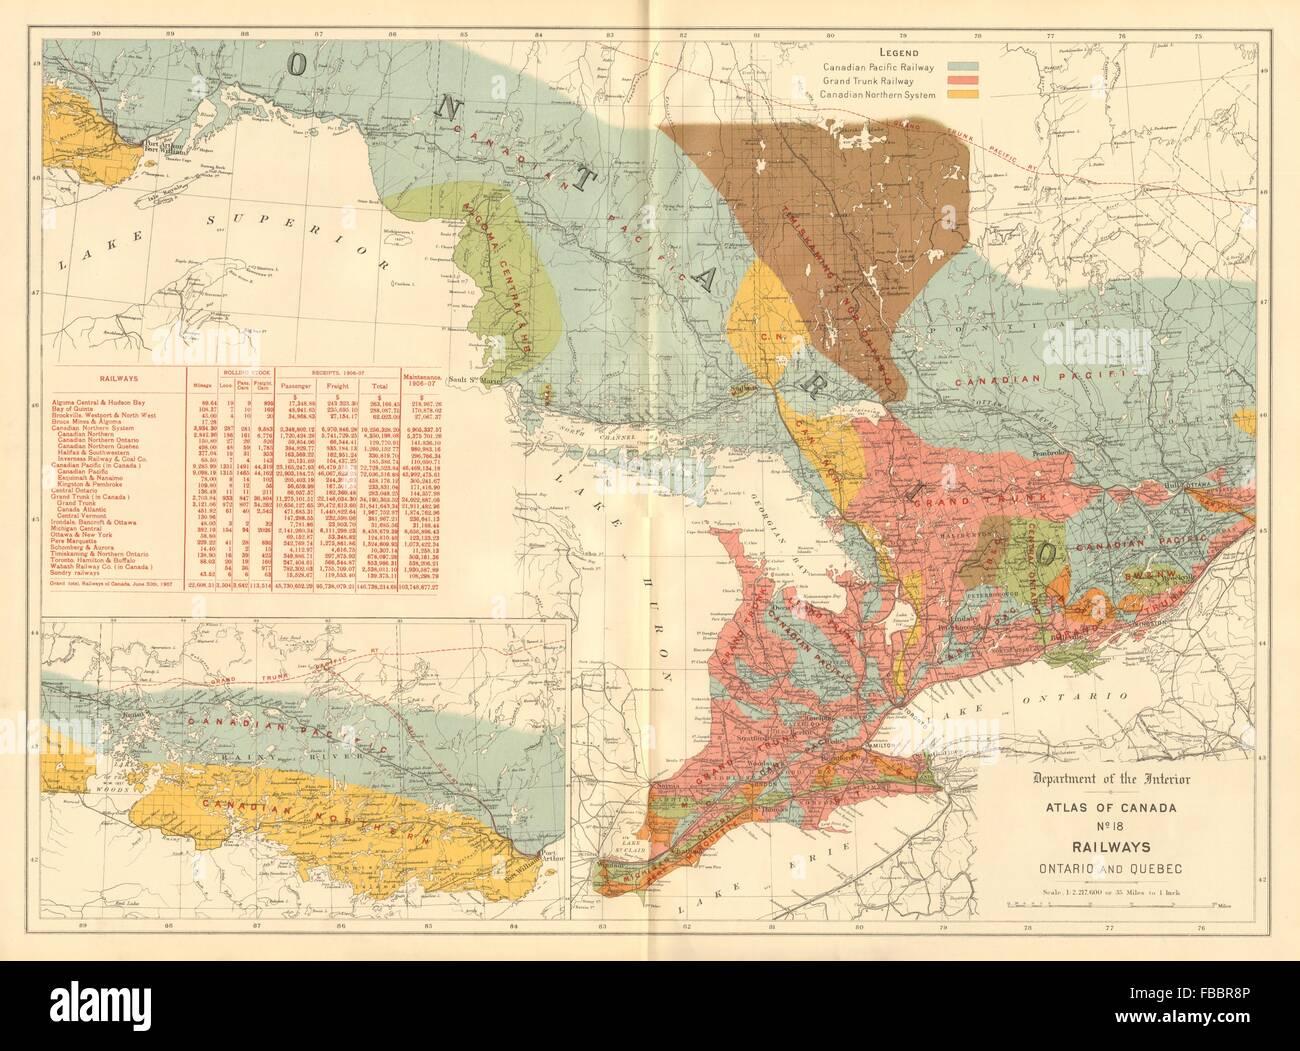 Map Of Northern Quebec Canada.Canada Railways Ontario Quebec Grand Trunk Canadian Stock